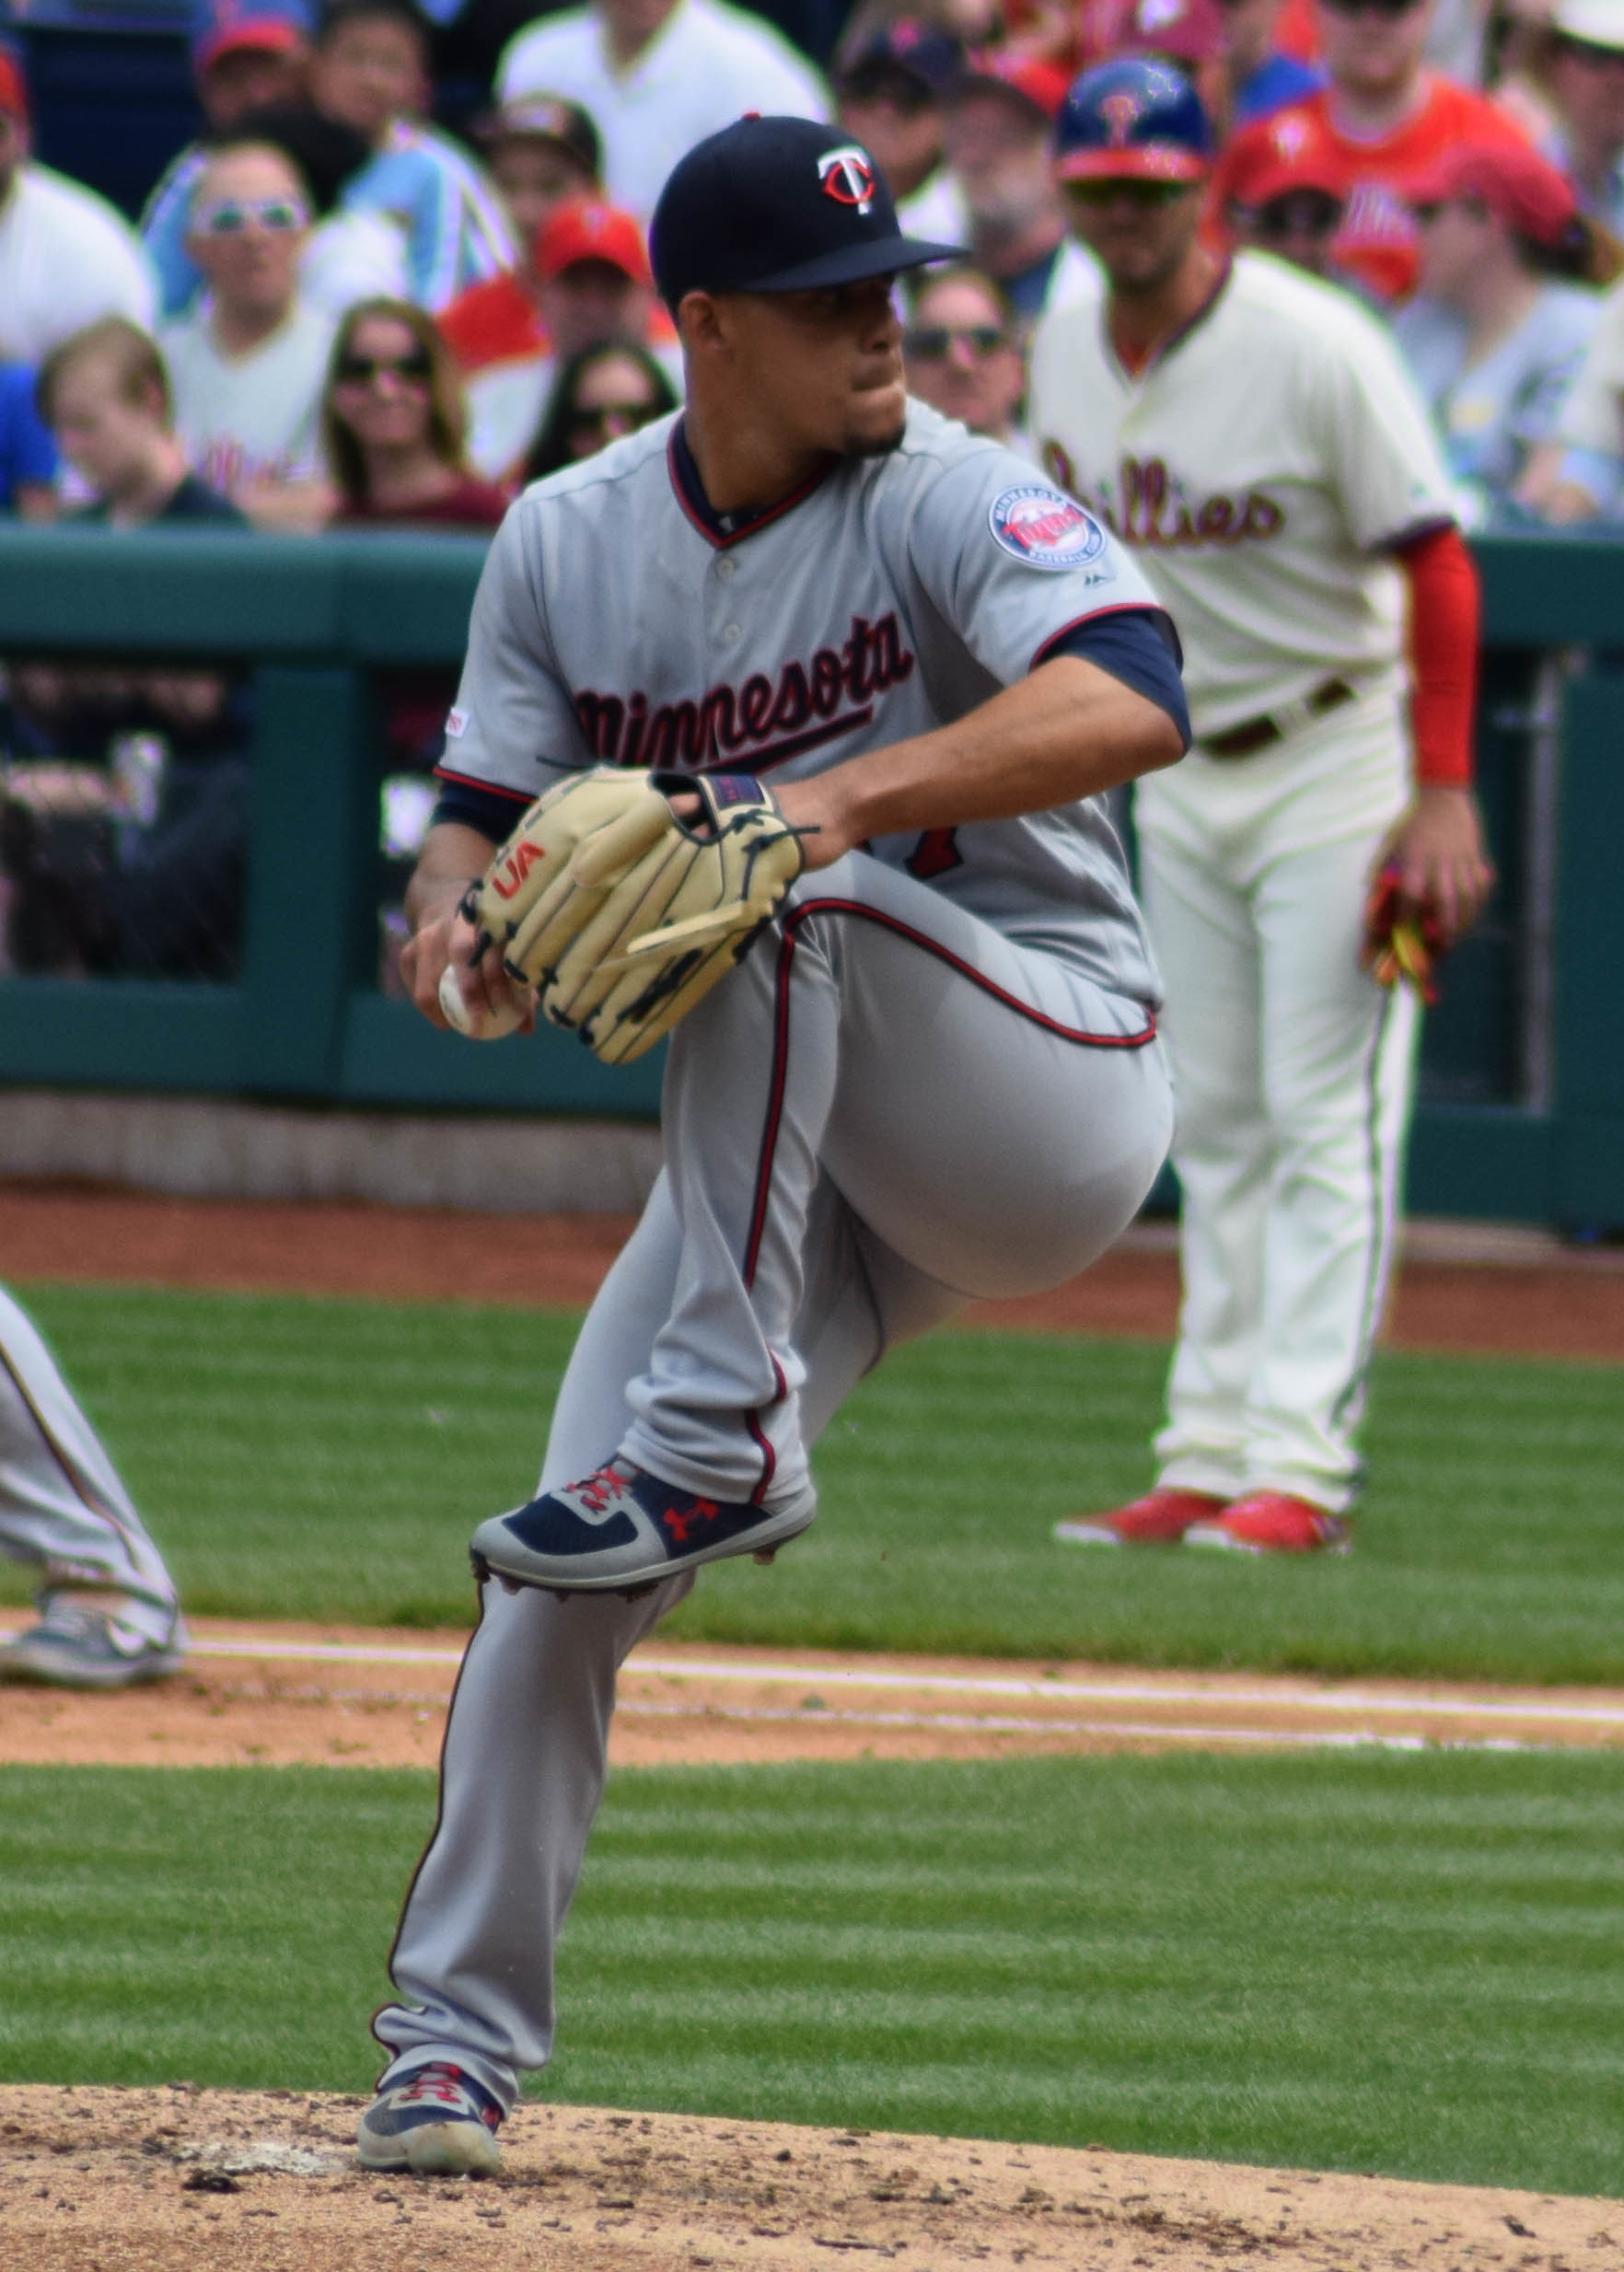 Spring training roundup: Twins' Berrios impresses